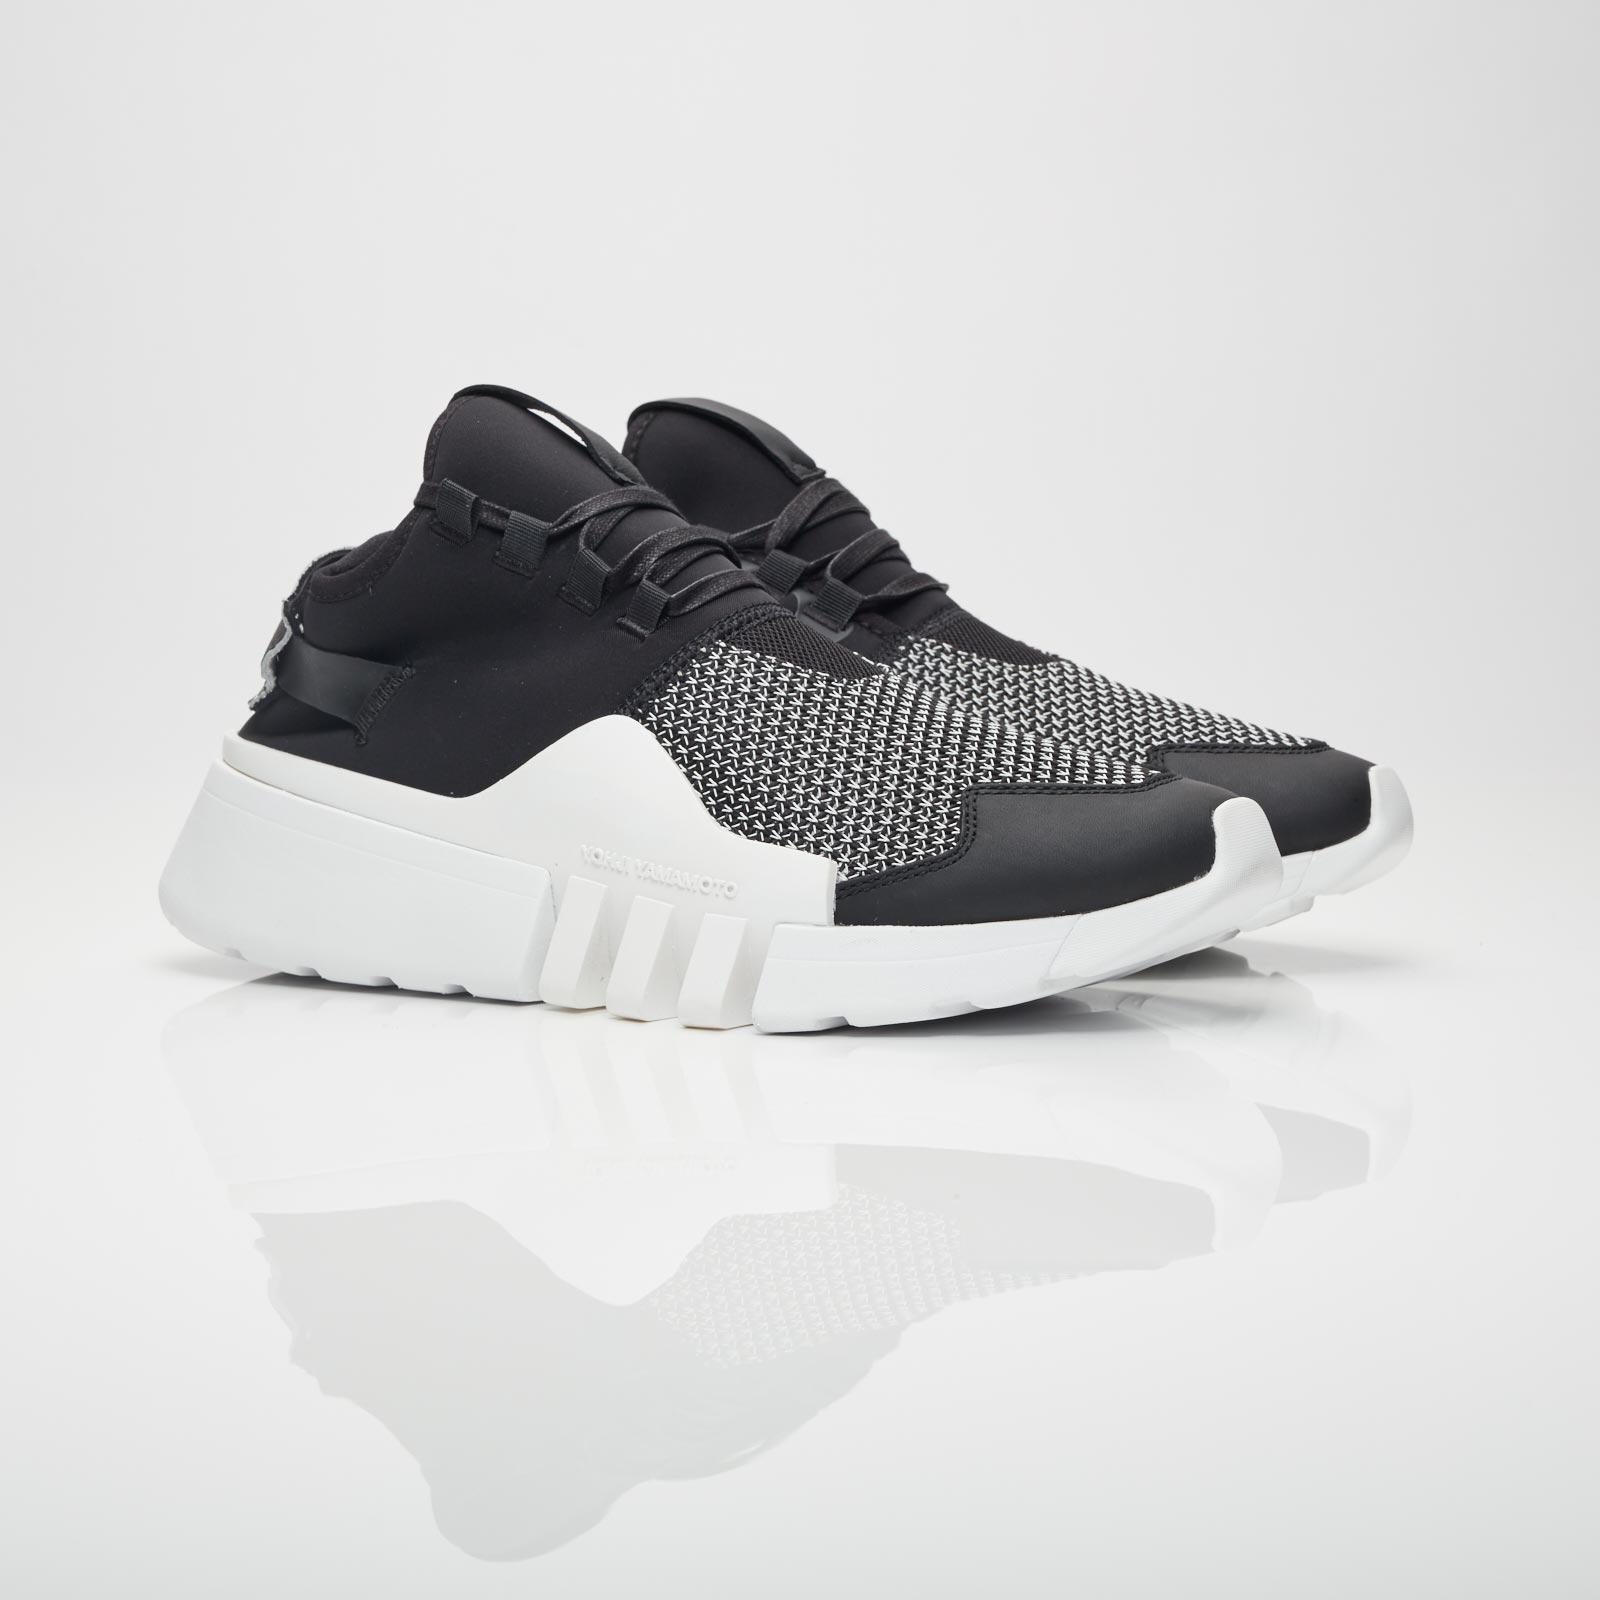 e41db79fd adidas Ayero - Cg3169 - Sneakersnstuff